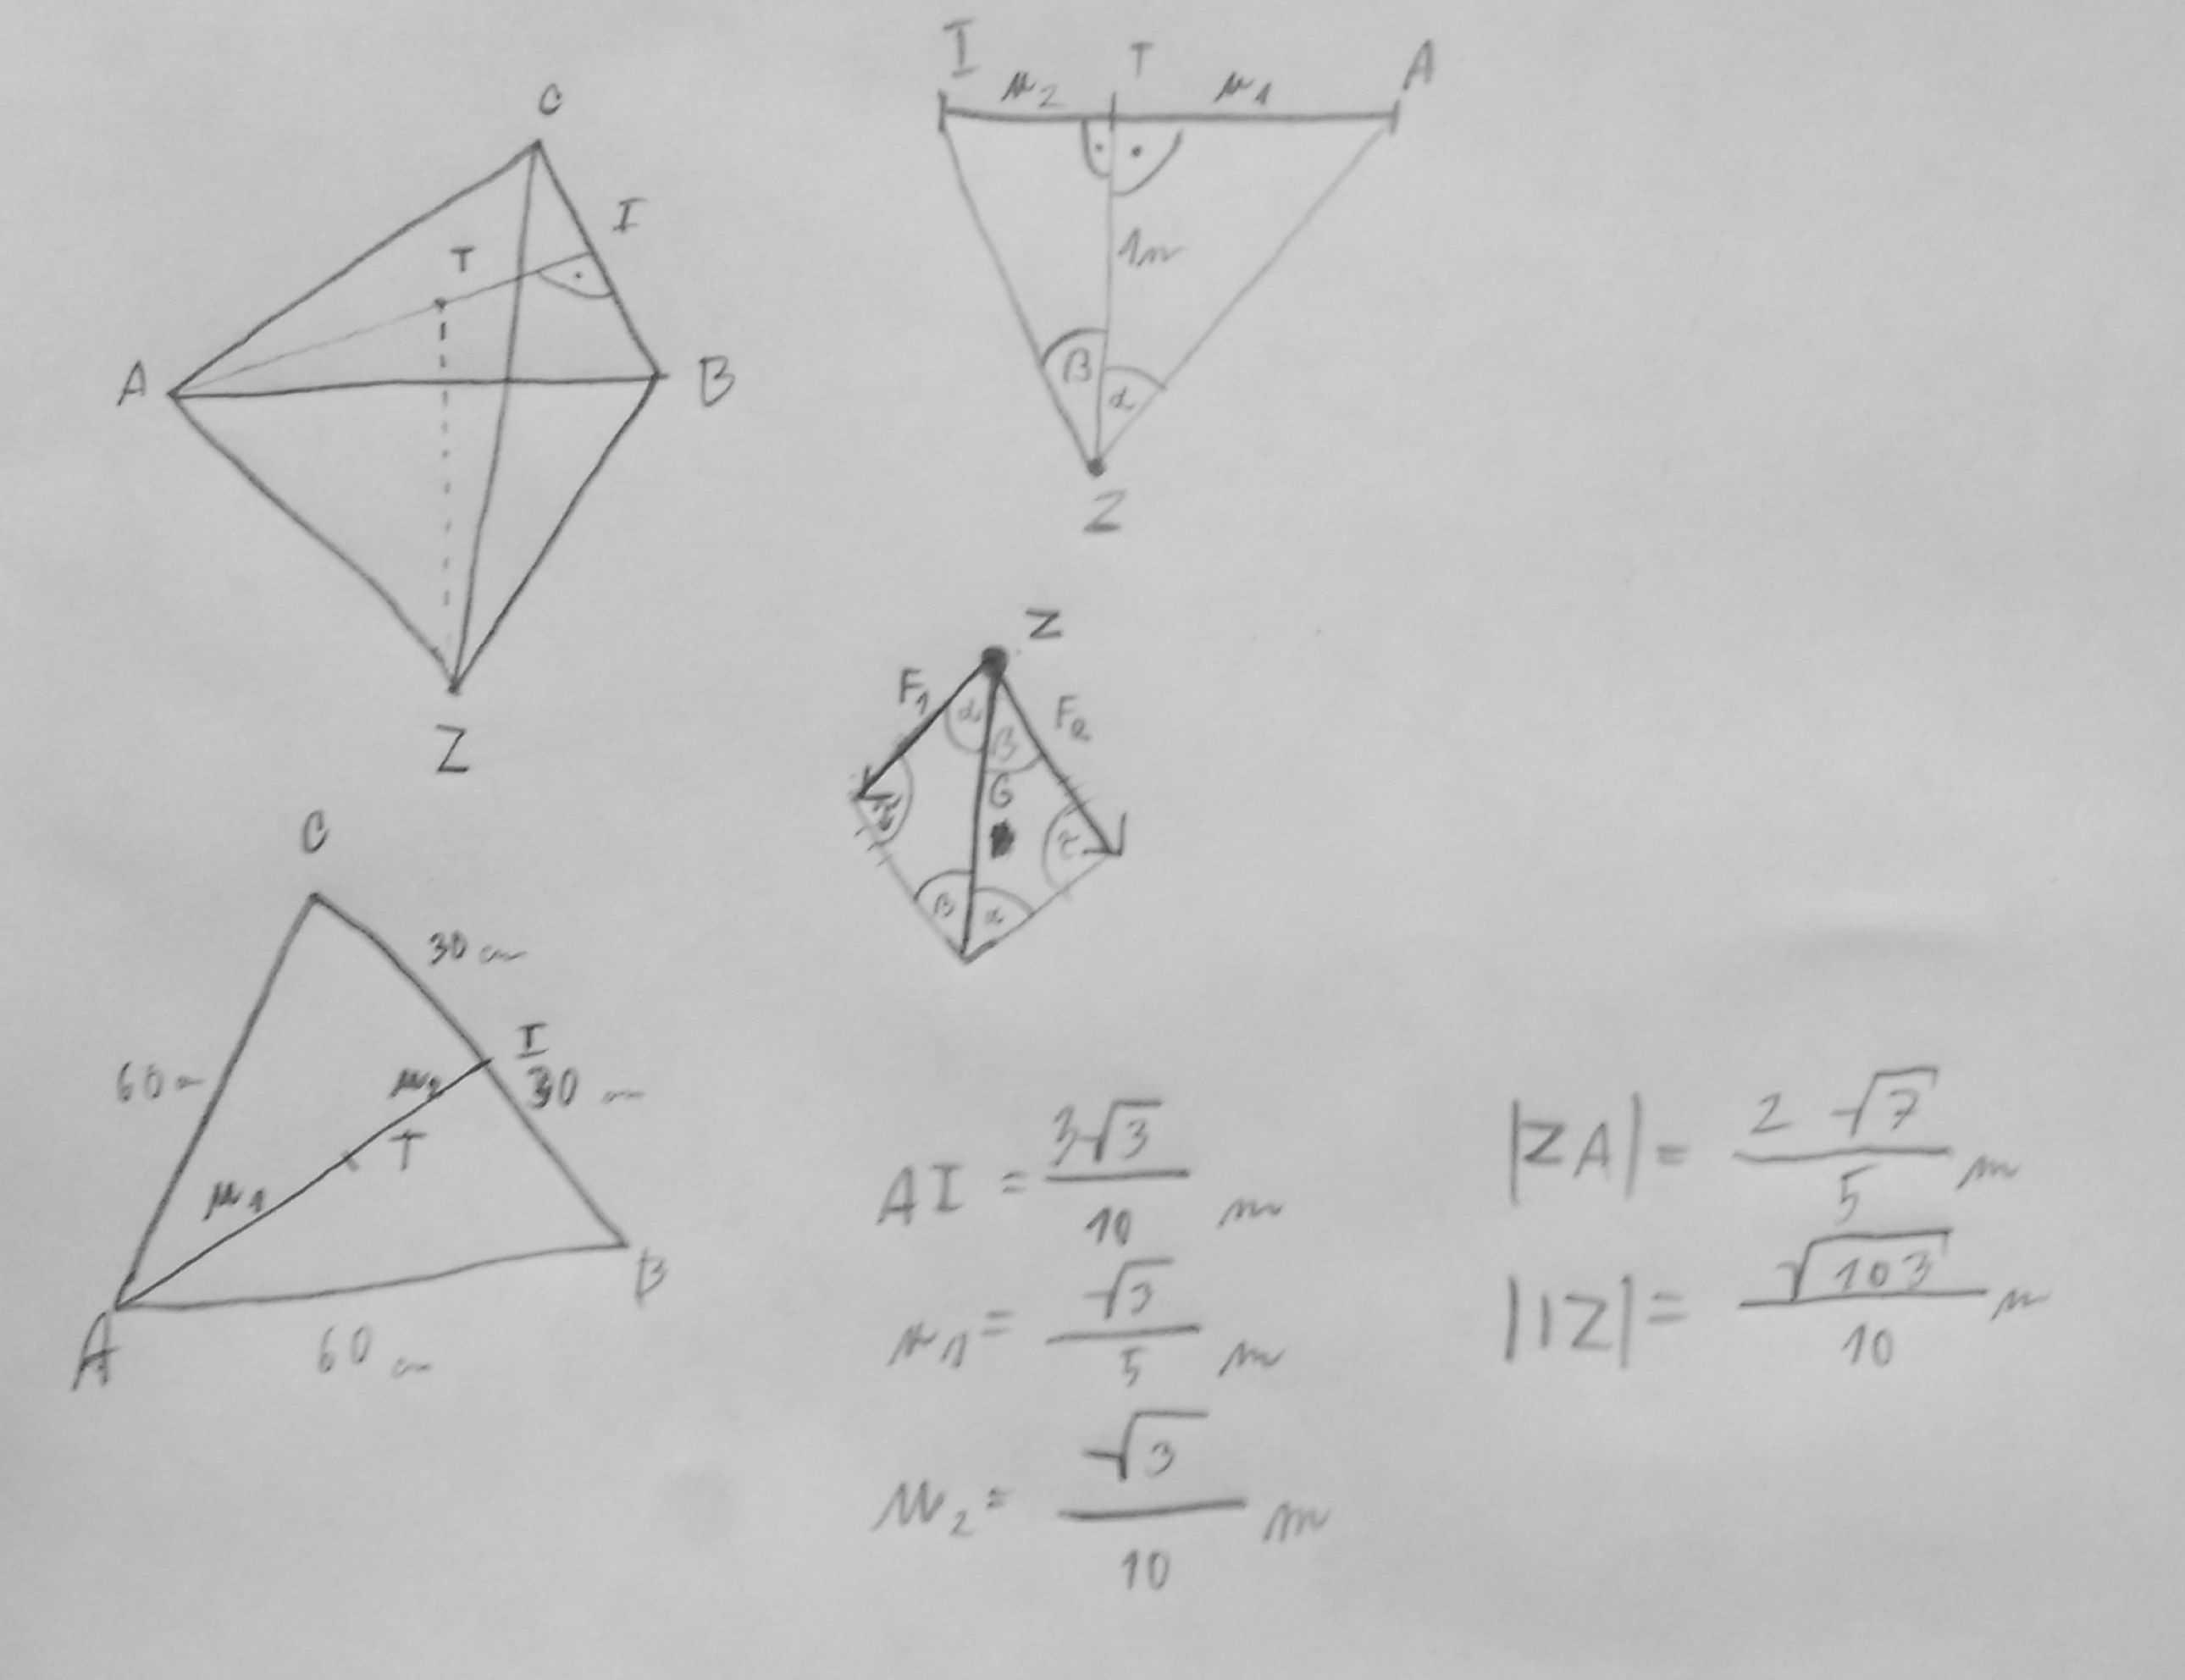 http://forum.matematika.cz/upload3/img/2017-08/71699_COMuloha1.jpg